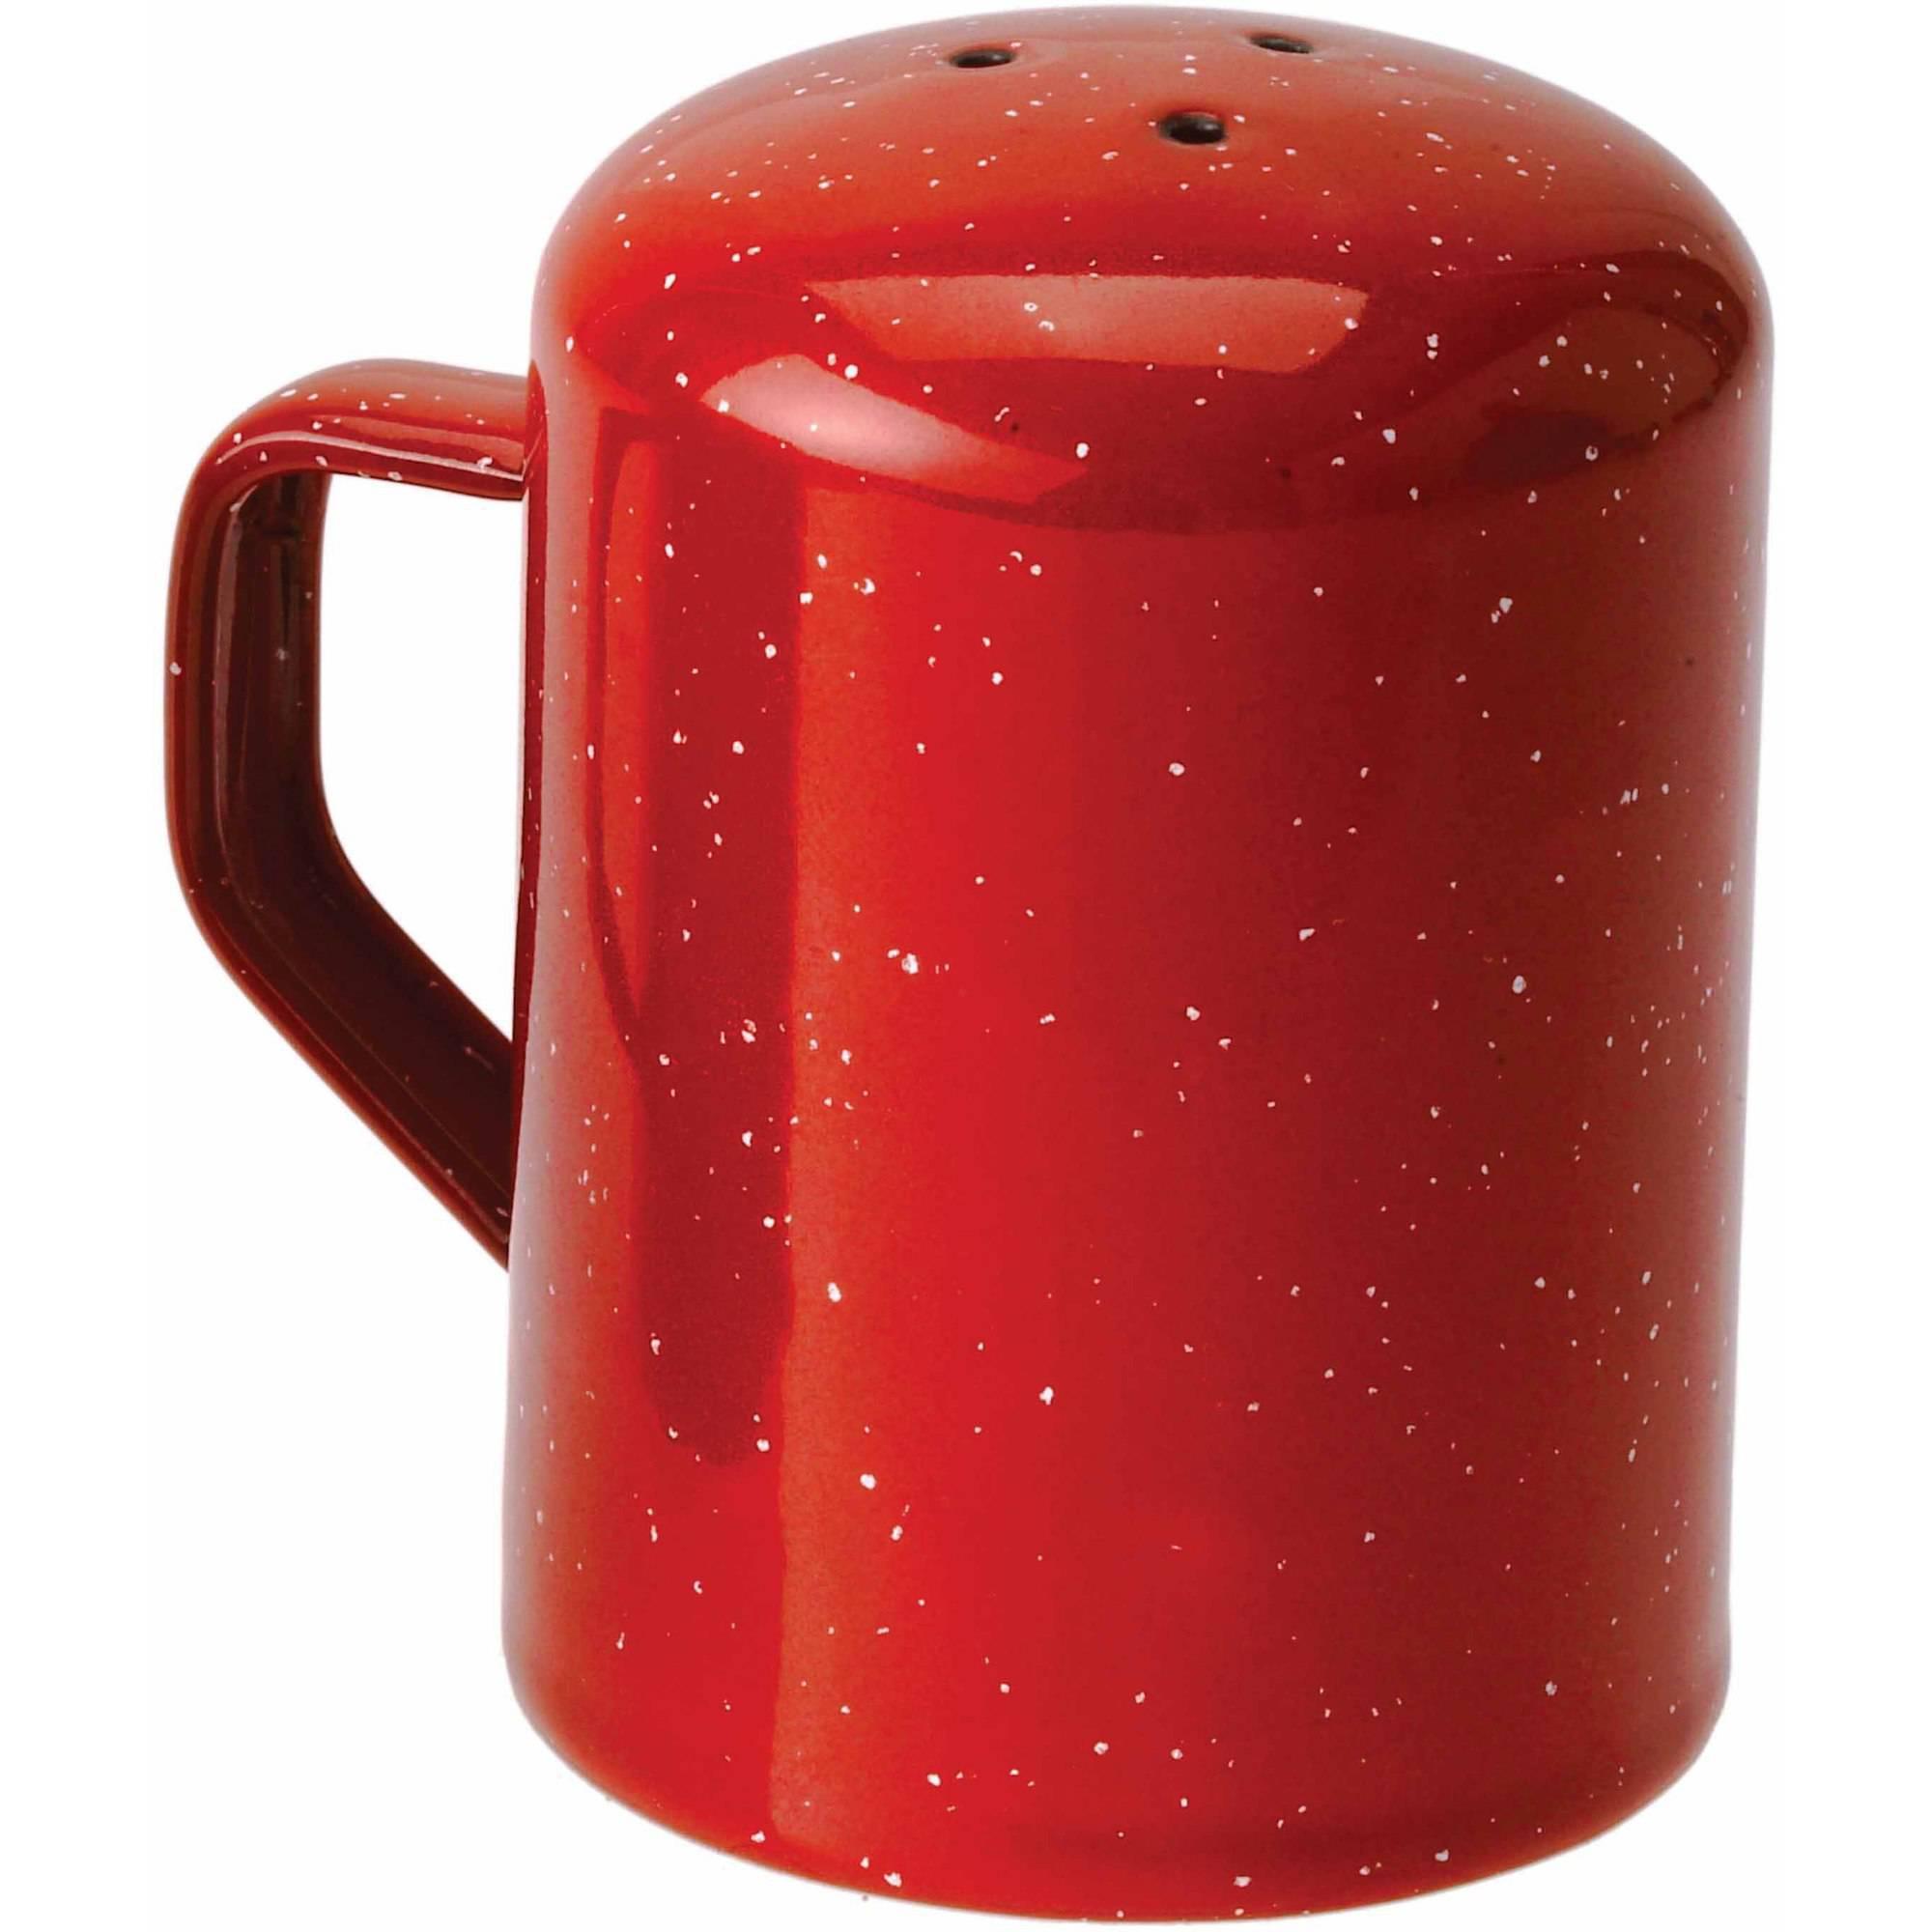 Sweepex Gsi Outdoors Enamelware 3-Hole Salt Shaker, Red